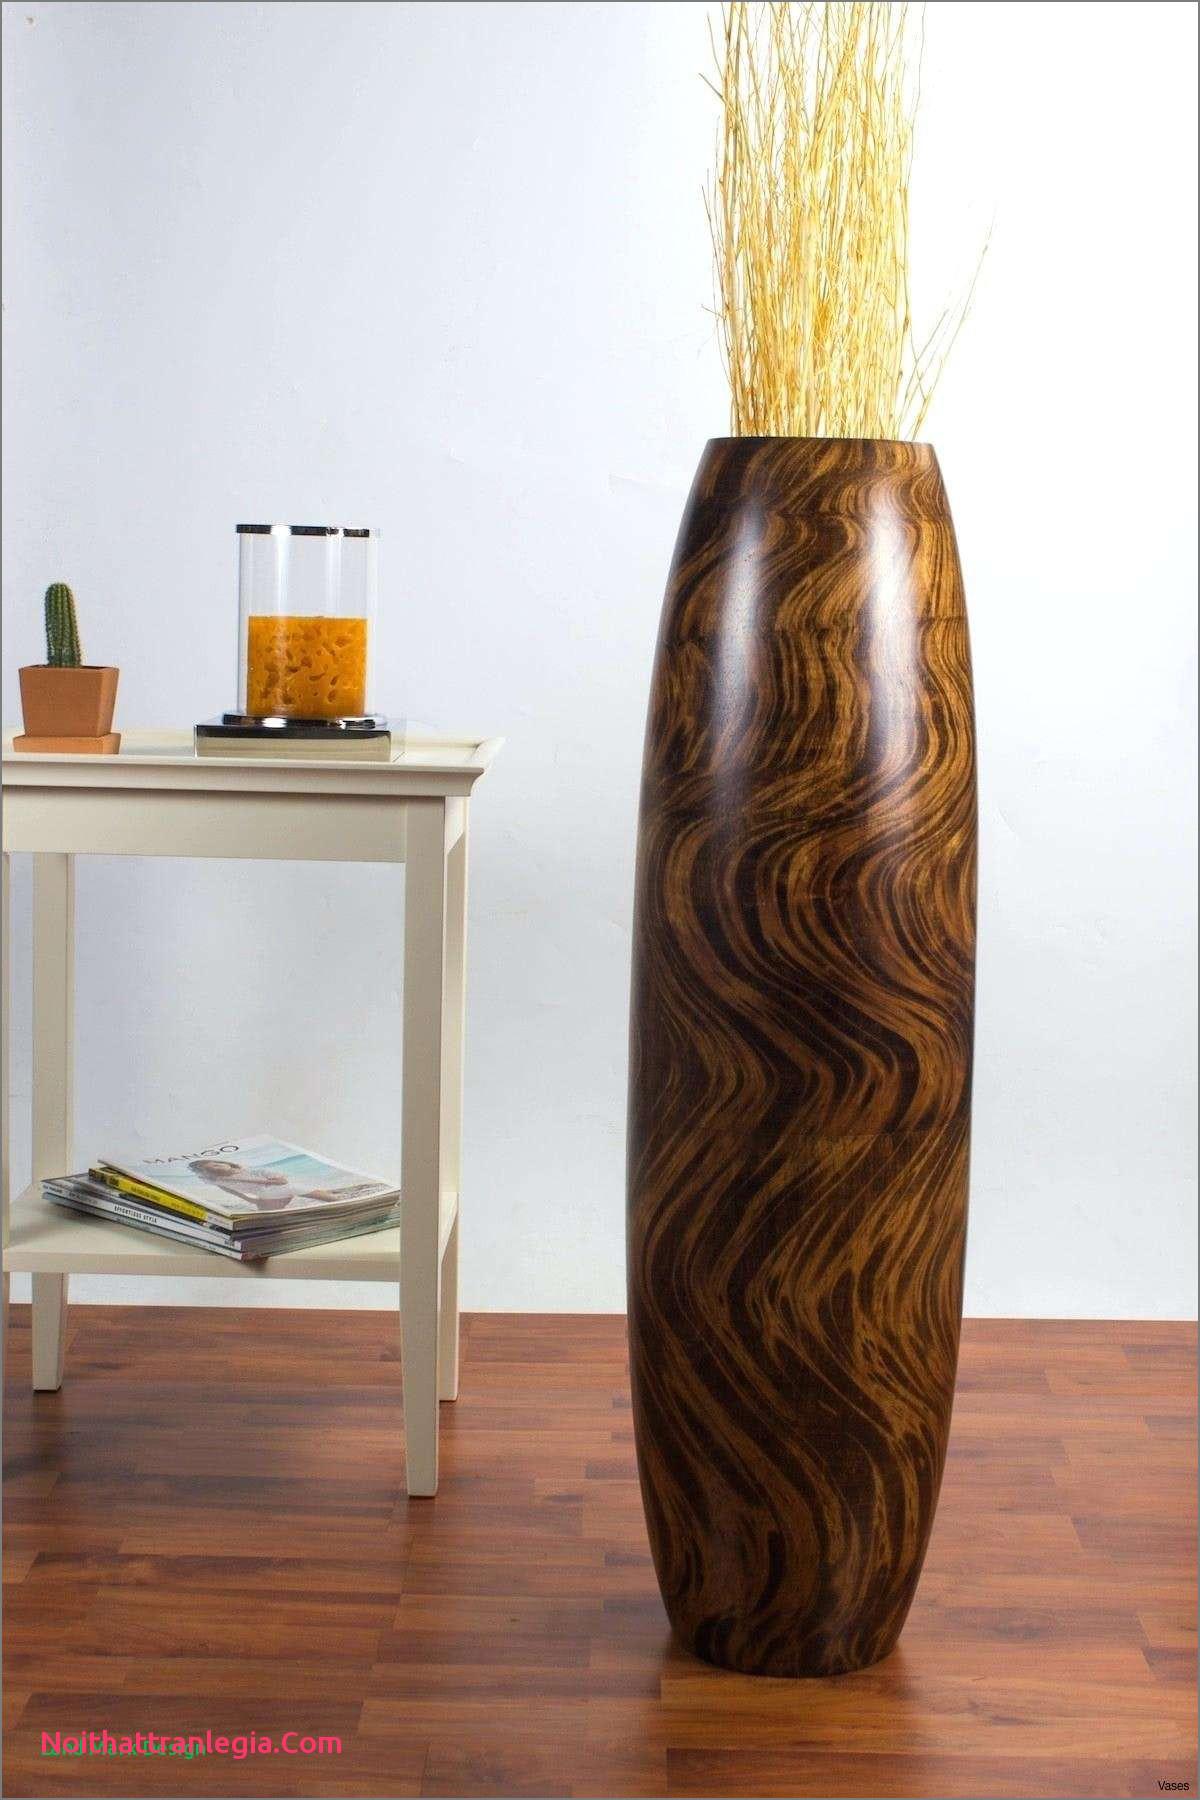 large orange vase of beautiful large orange glass floor vase noithattranlegia vases design regarding floor vase with branches vases tall ceramic ikea ukh stand lighted ideas glass i 9d